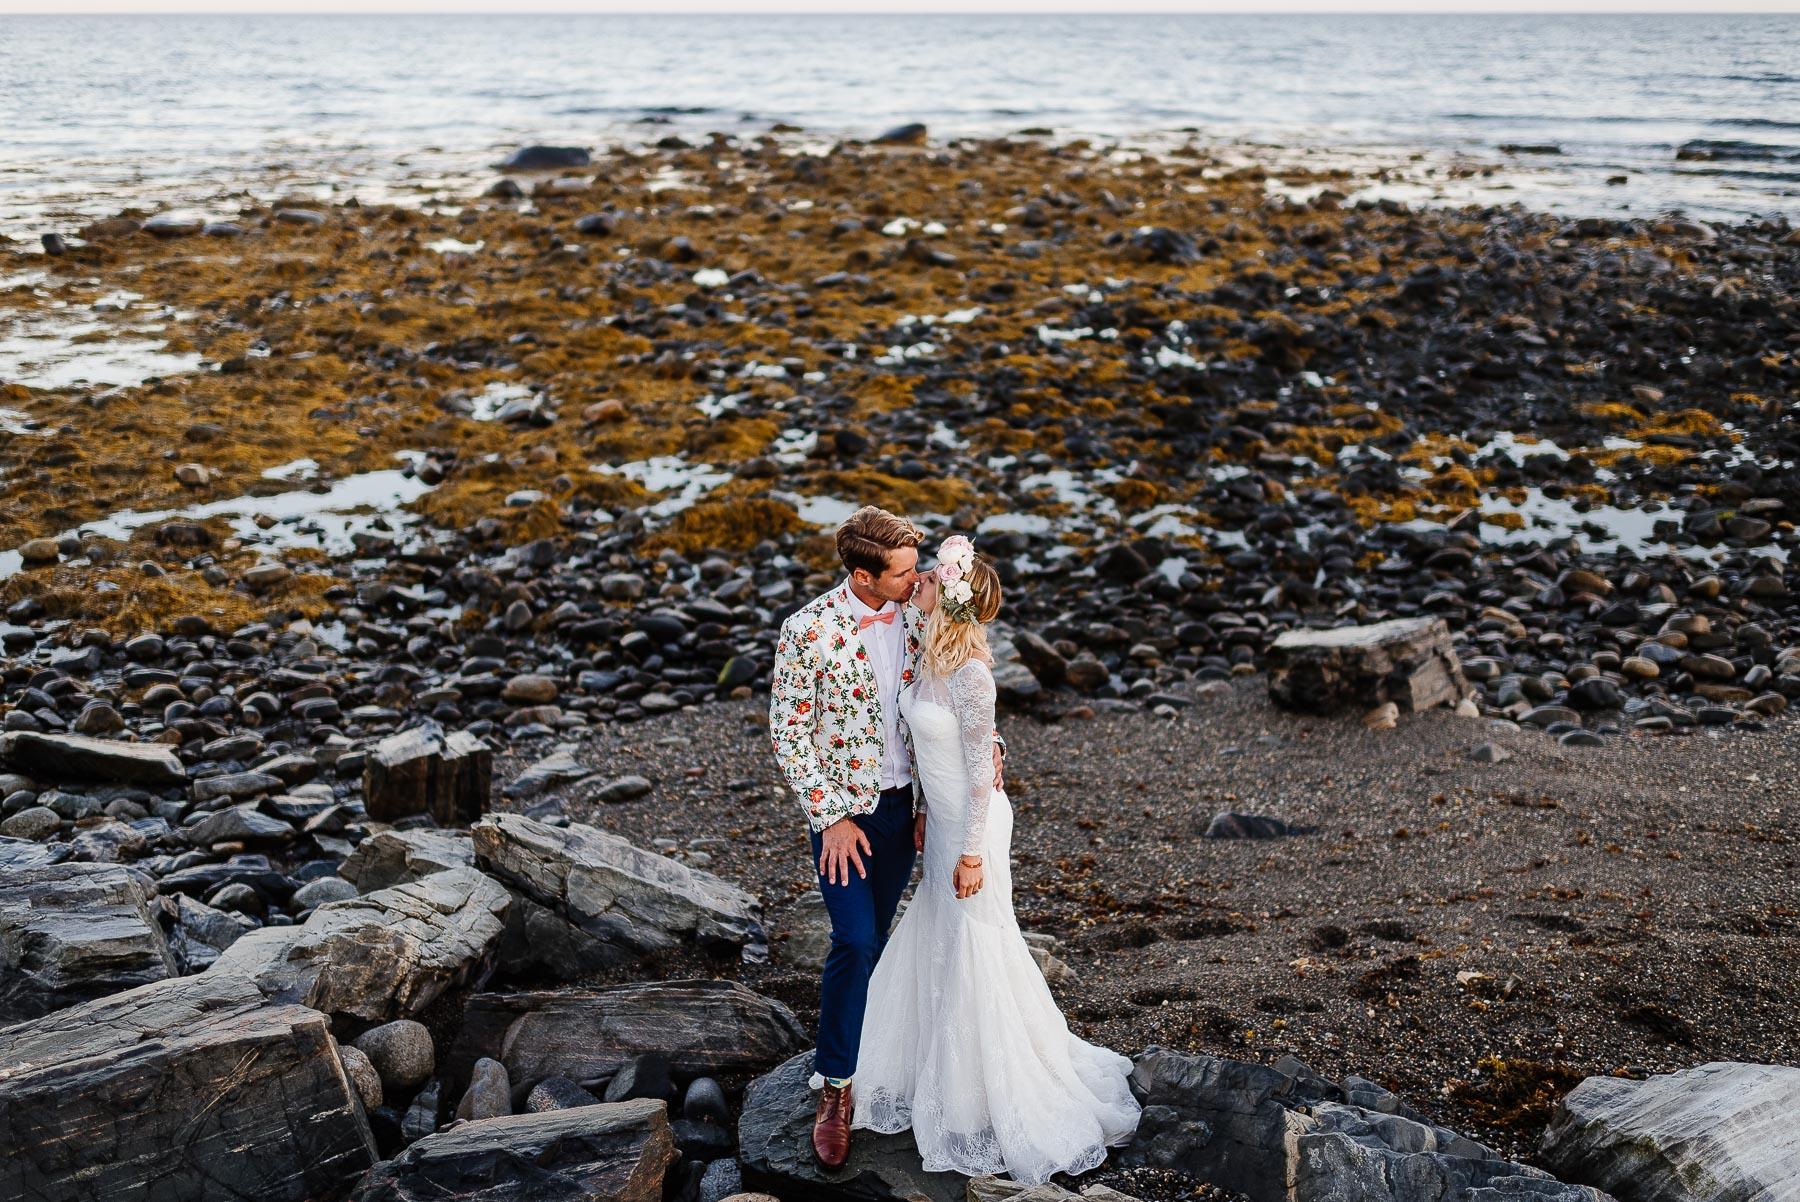 137-Bohemian New Hampshire Beach Wedding Rye New Hampshire Weddings Summer Sessions Surf Shop Longbrook Photography.jpg